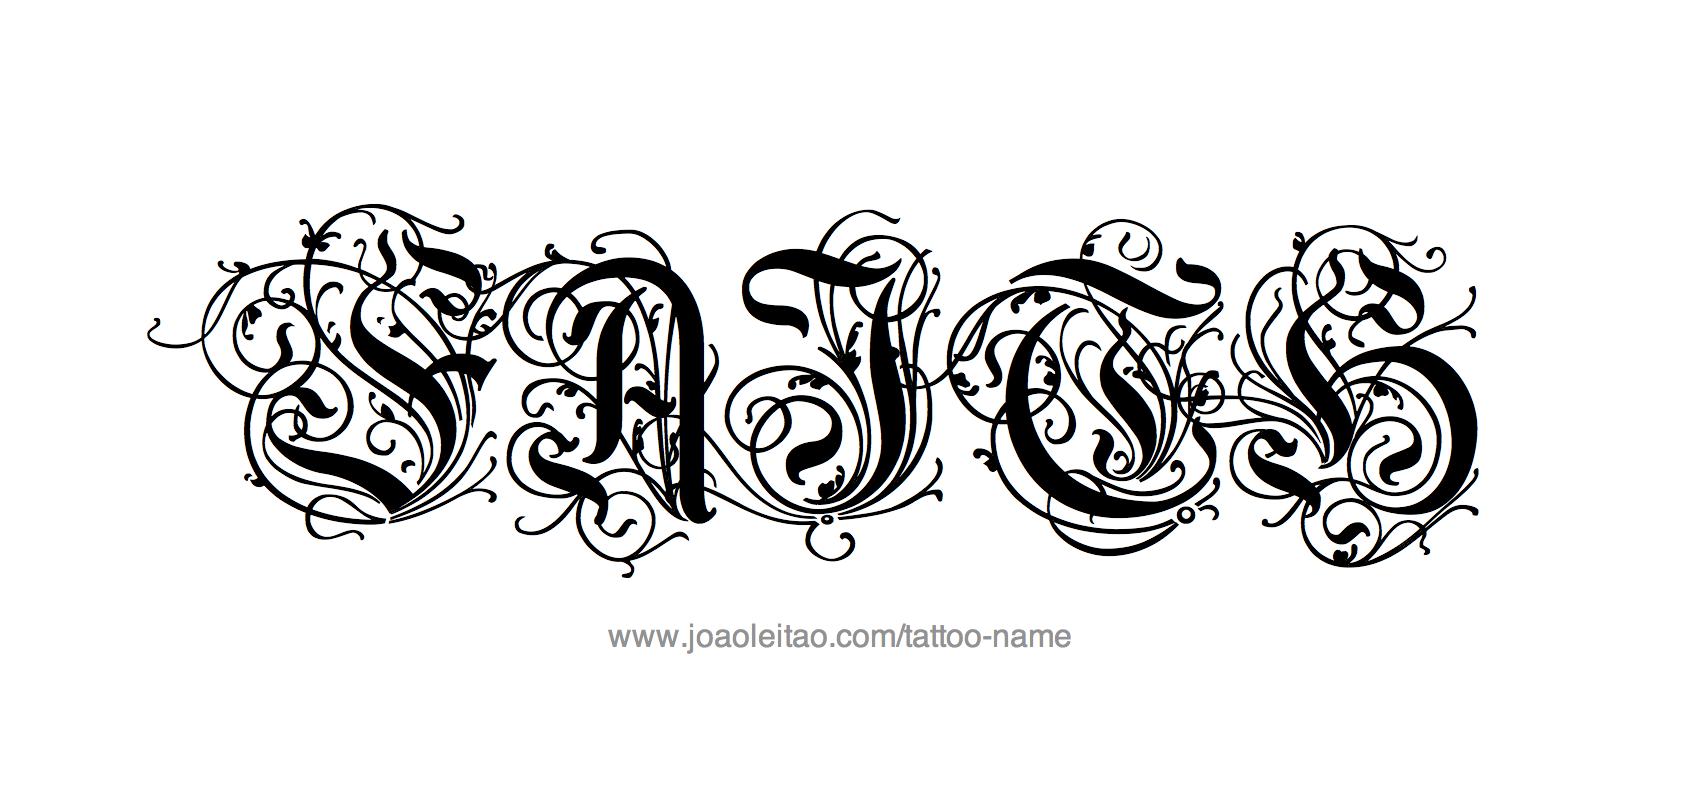 faith name tattoo designs